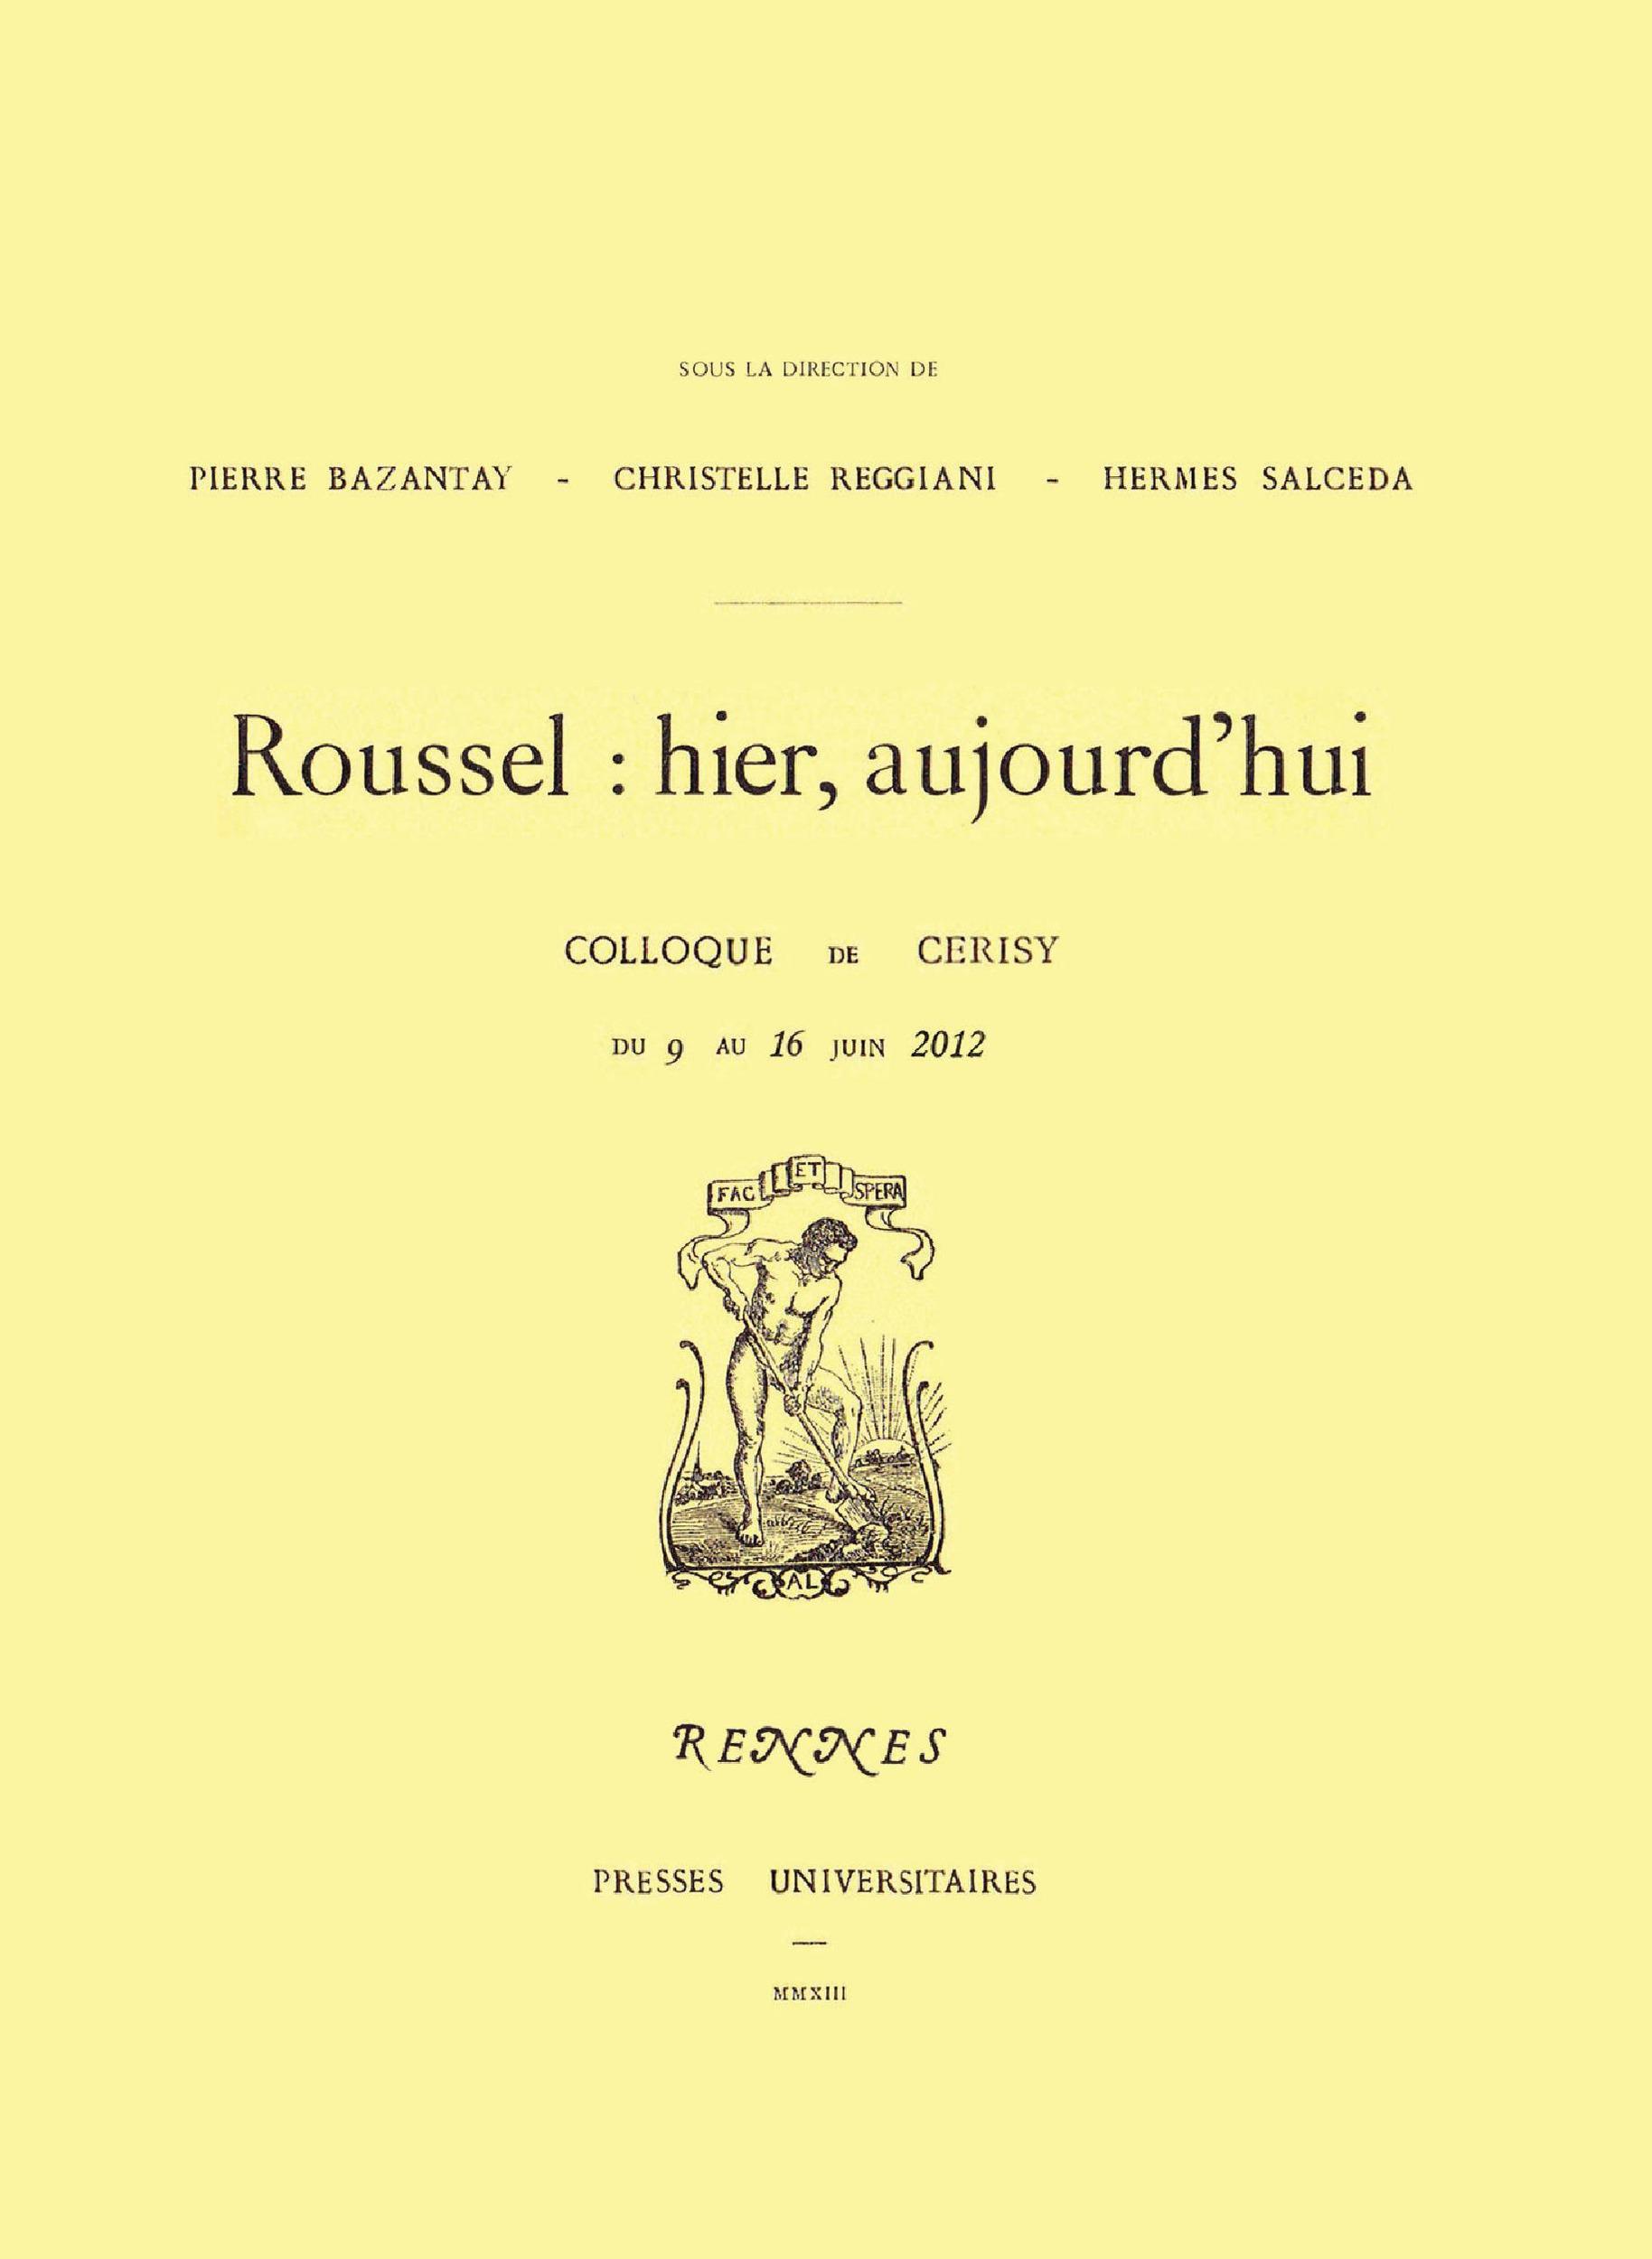 Roussel : hier, aujourd´hui  - Pierre Bazantay  - Christelle Reggiani  - Hermes Salceda